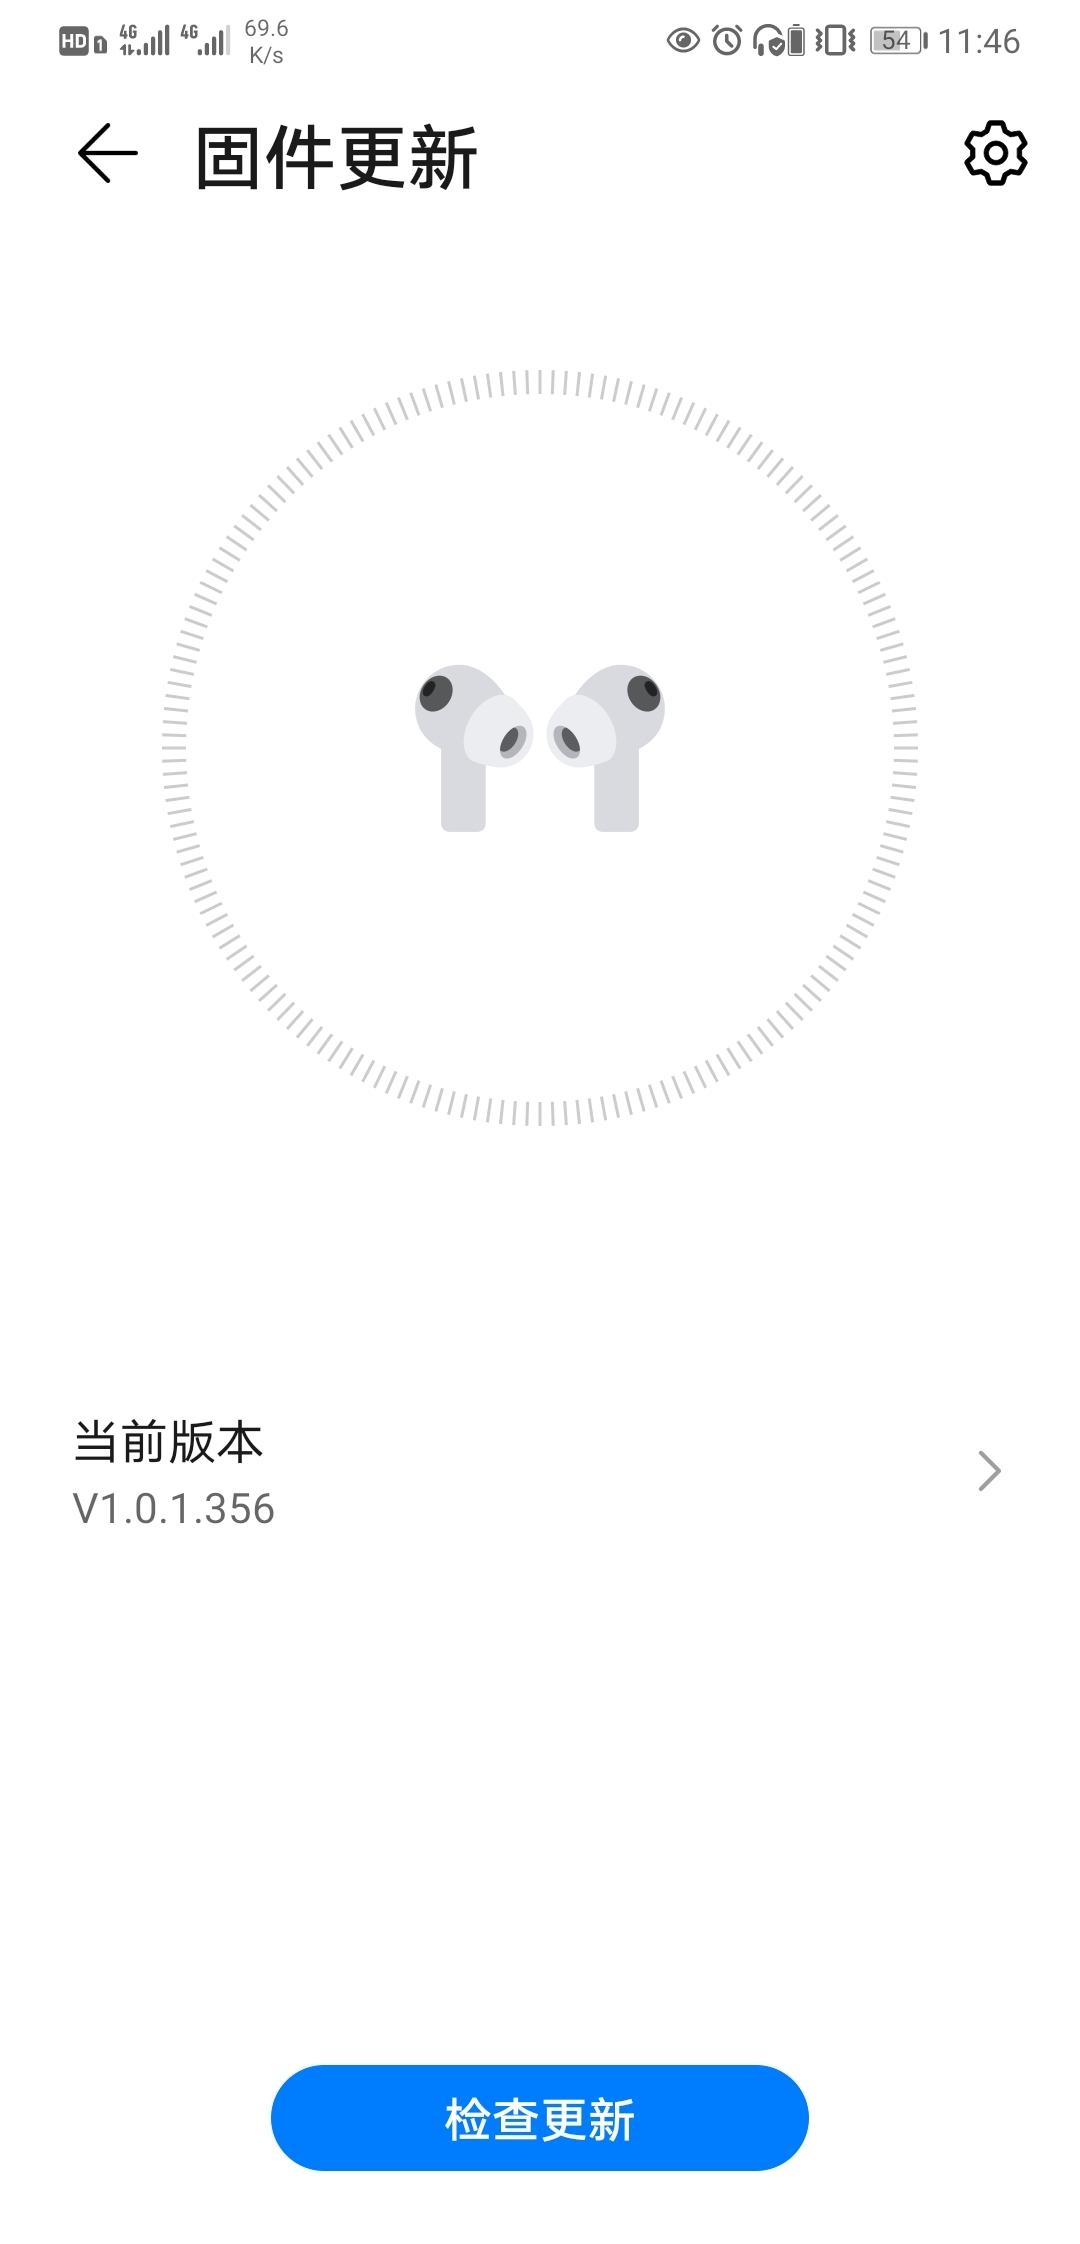 Screenshot_20210419_114640_com.huawei.smarthome.jpg